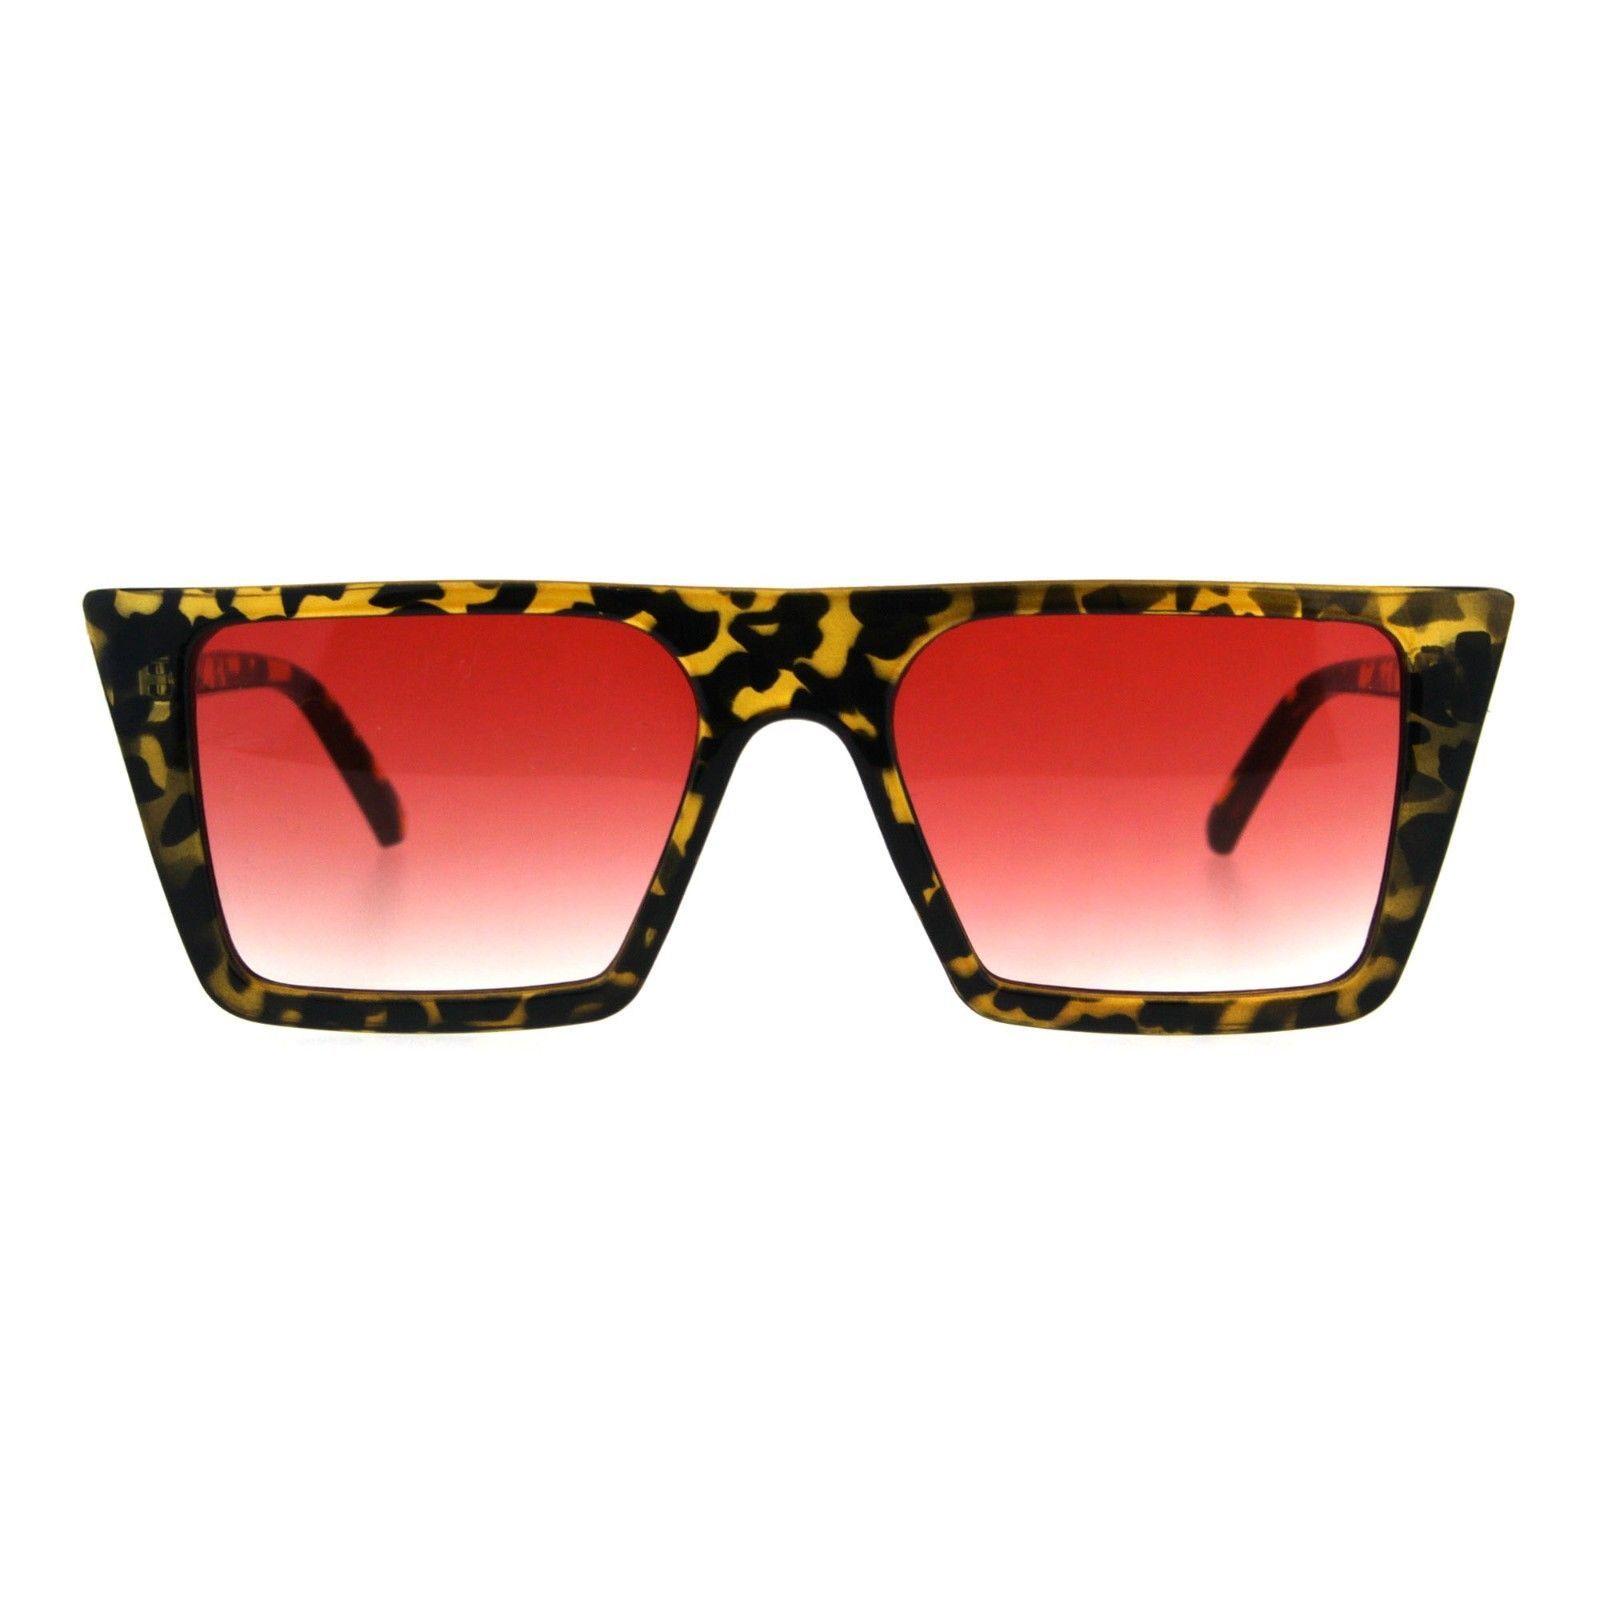 Retro Modern Womens Sunglasses Flat Top Rectangular Trapezoid Frame UV 400